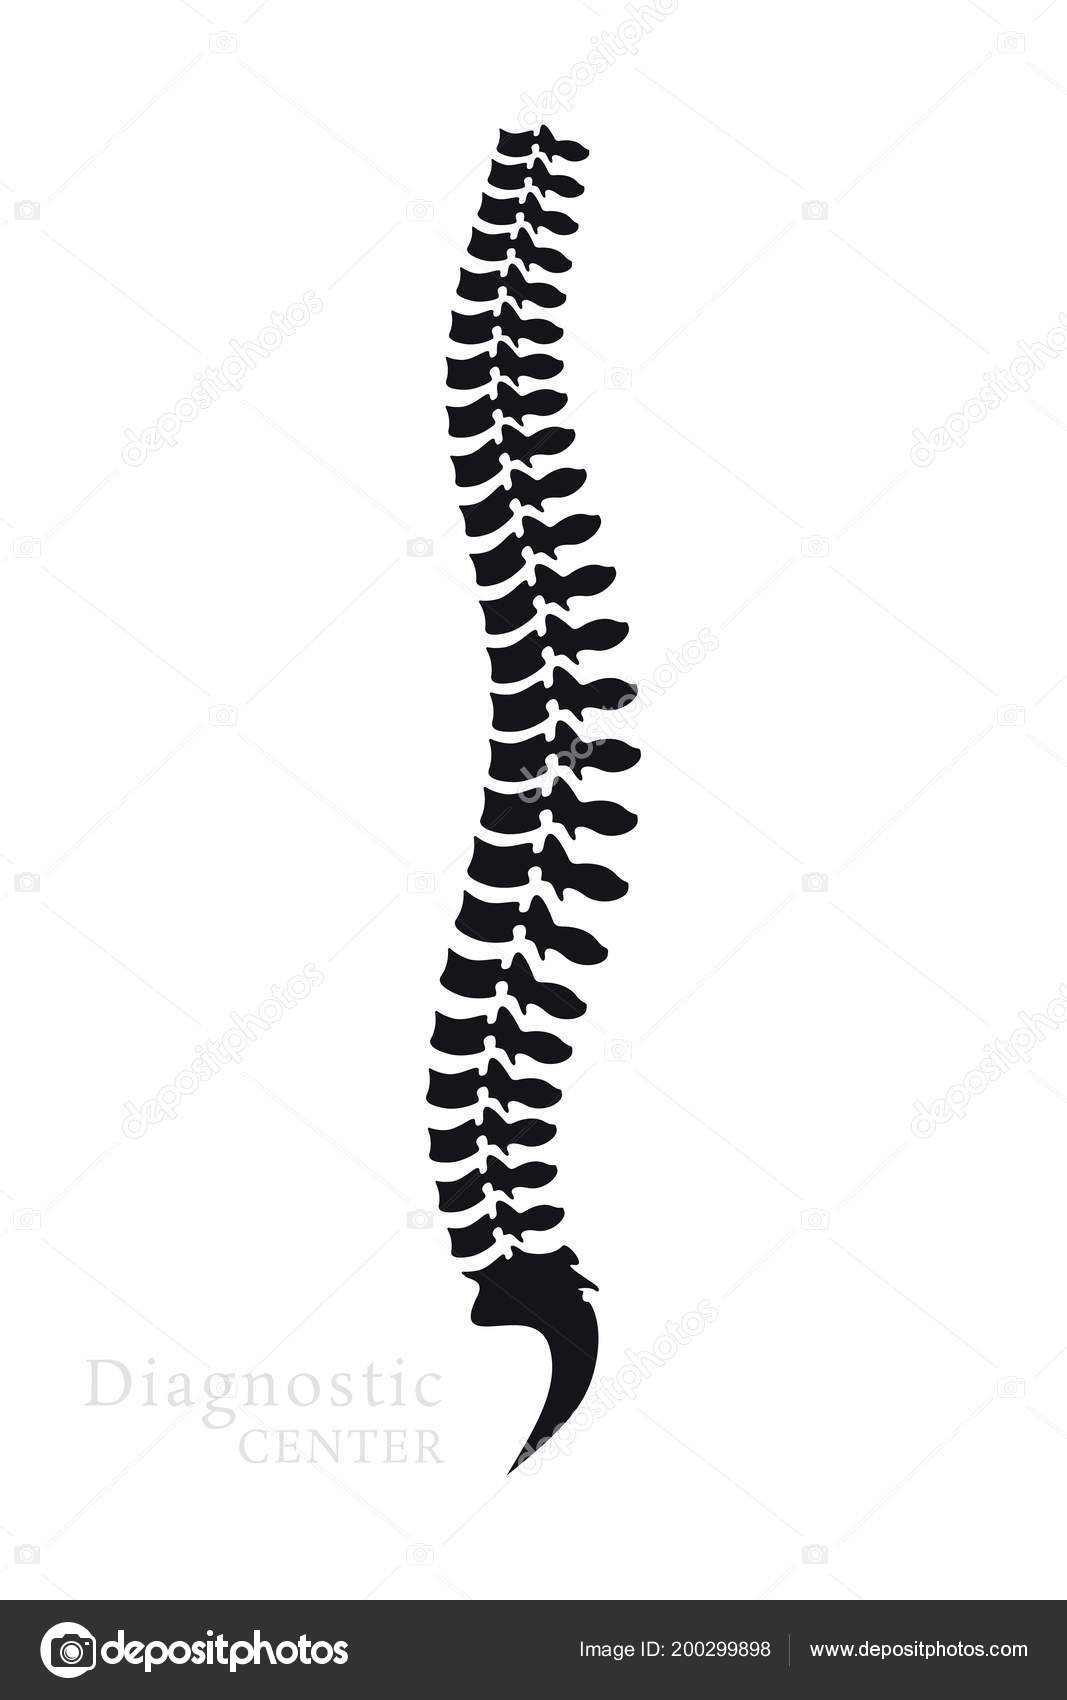 Columna Vertebral Todas Las Vertebras Cervical Toracica